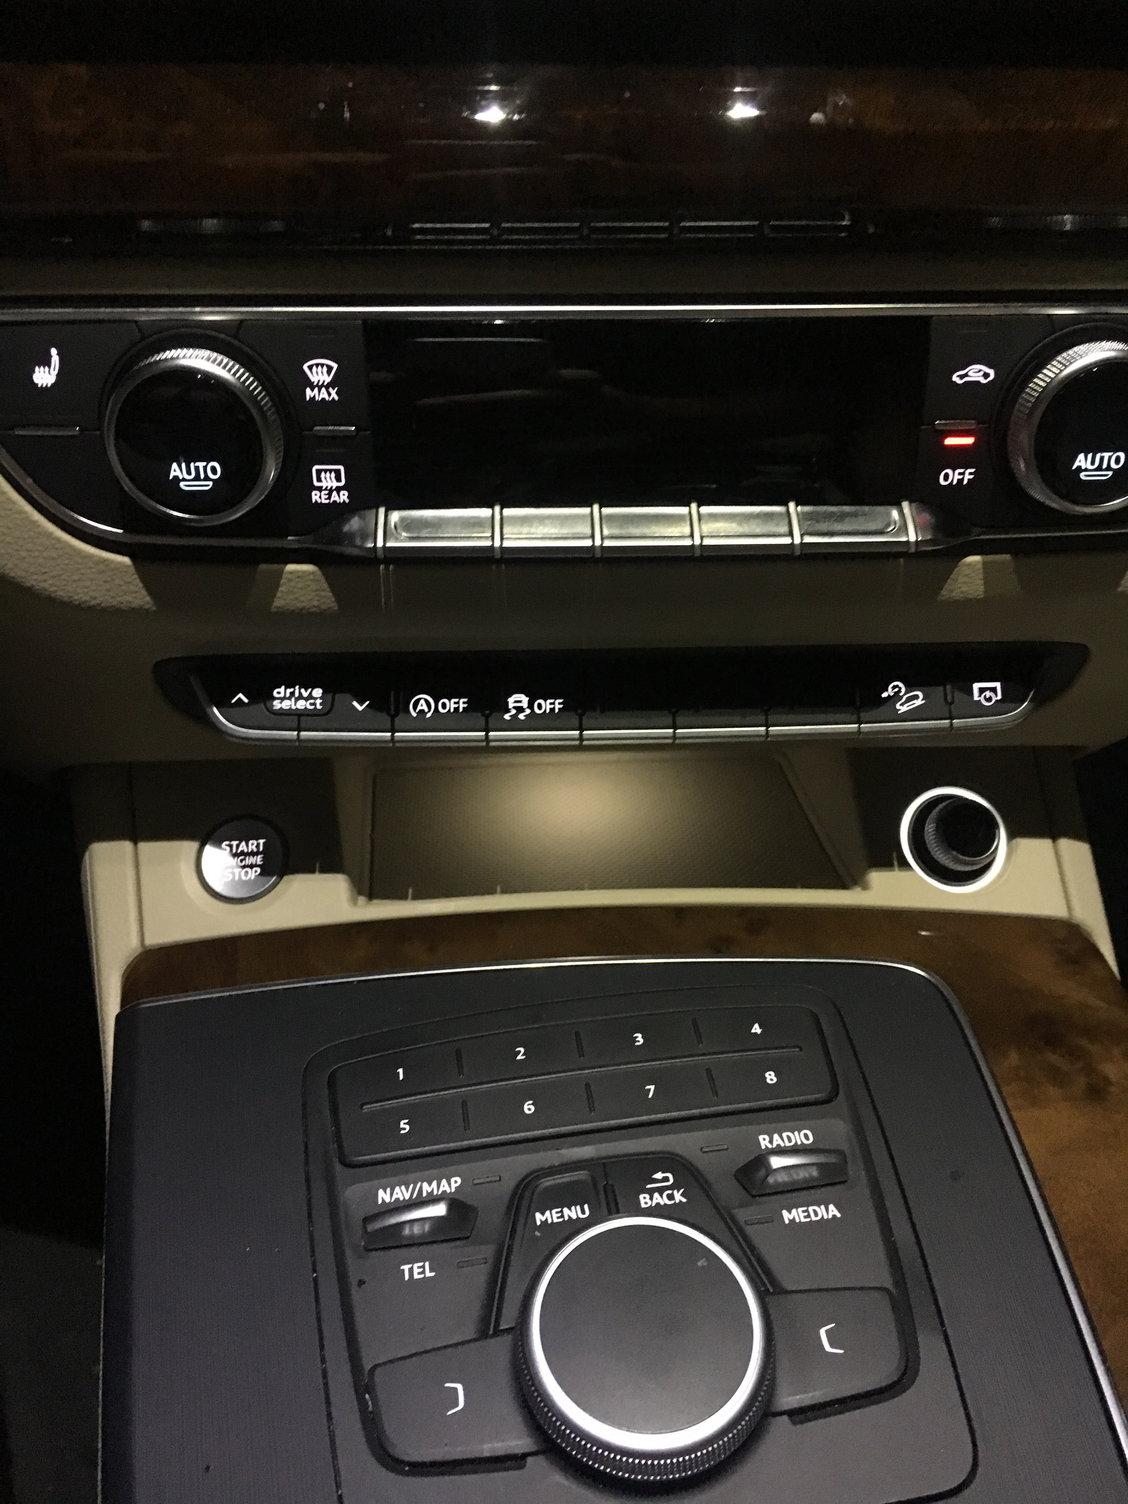 AC blows warm air intermittently - AudiWorld Forums